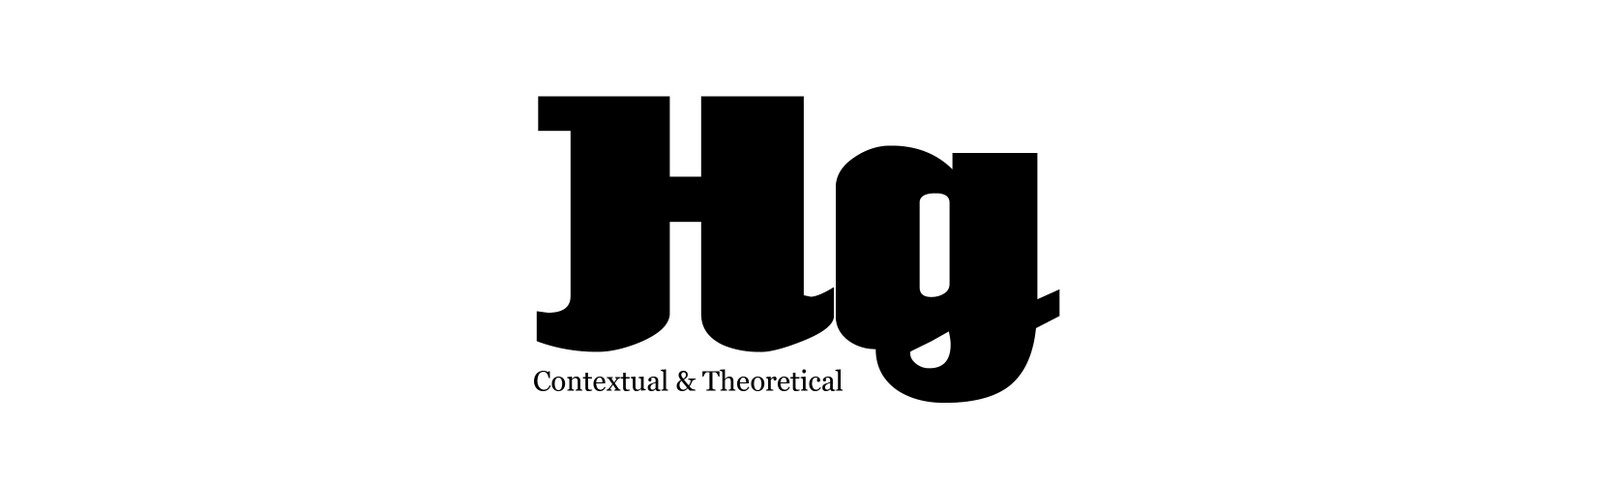 Hazel Contextual & Theoretical